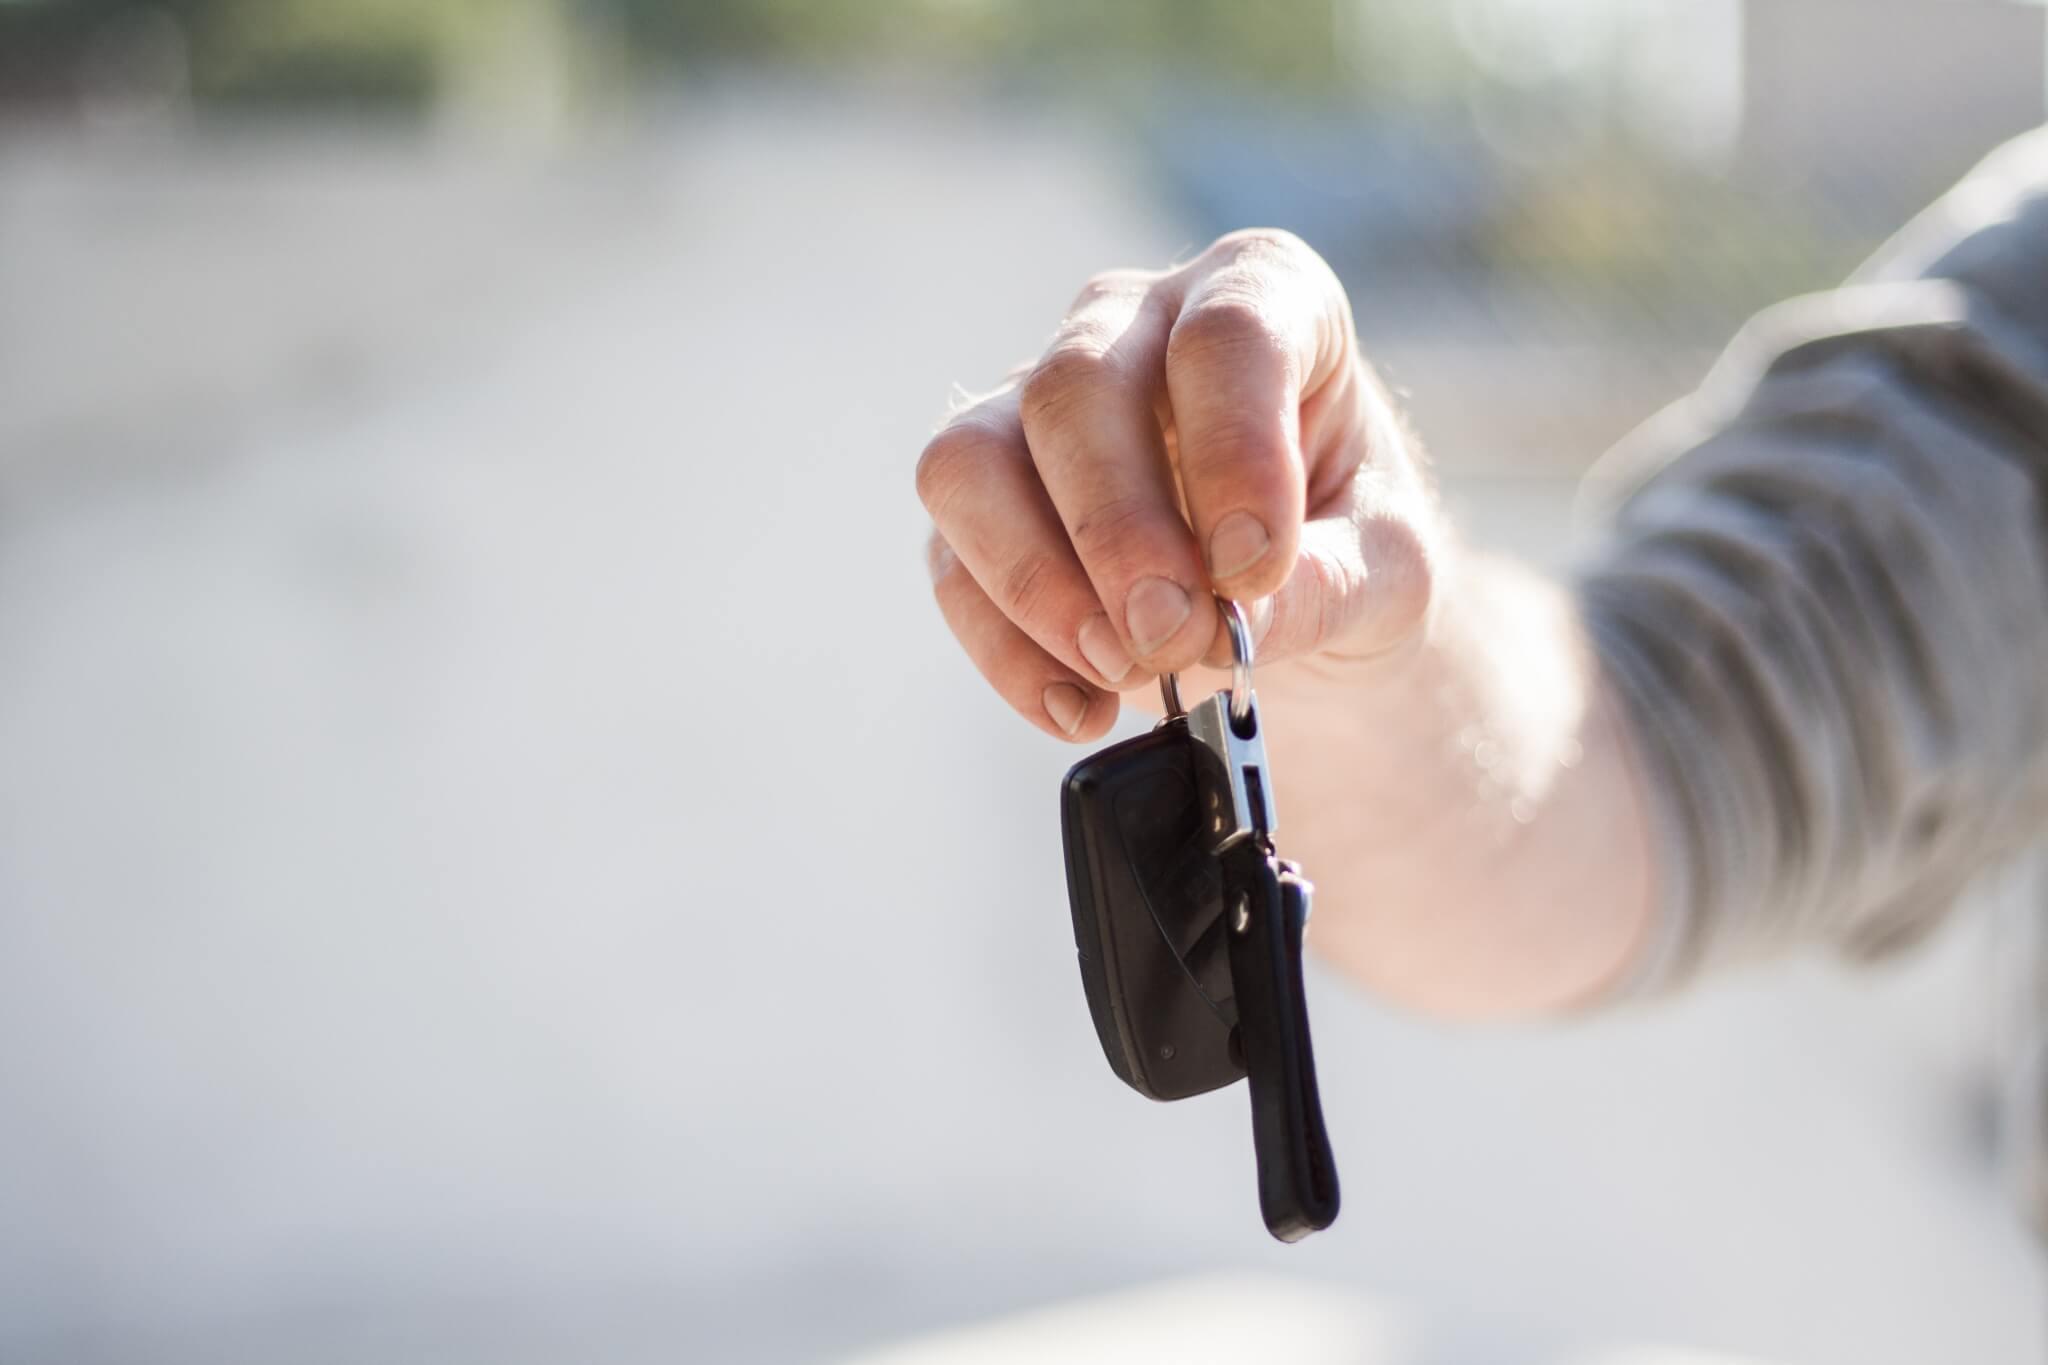 Top Questions You Should Ask Before You Rent a Car